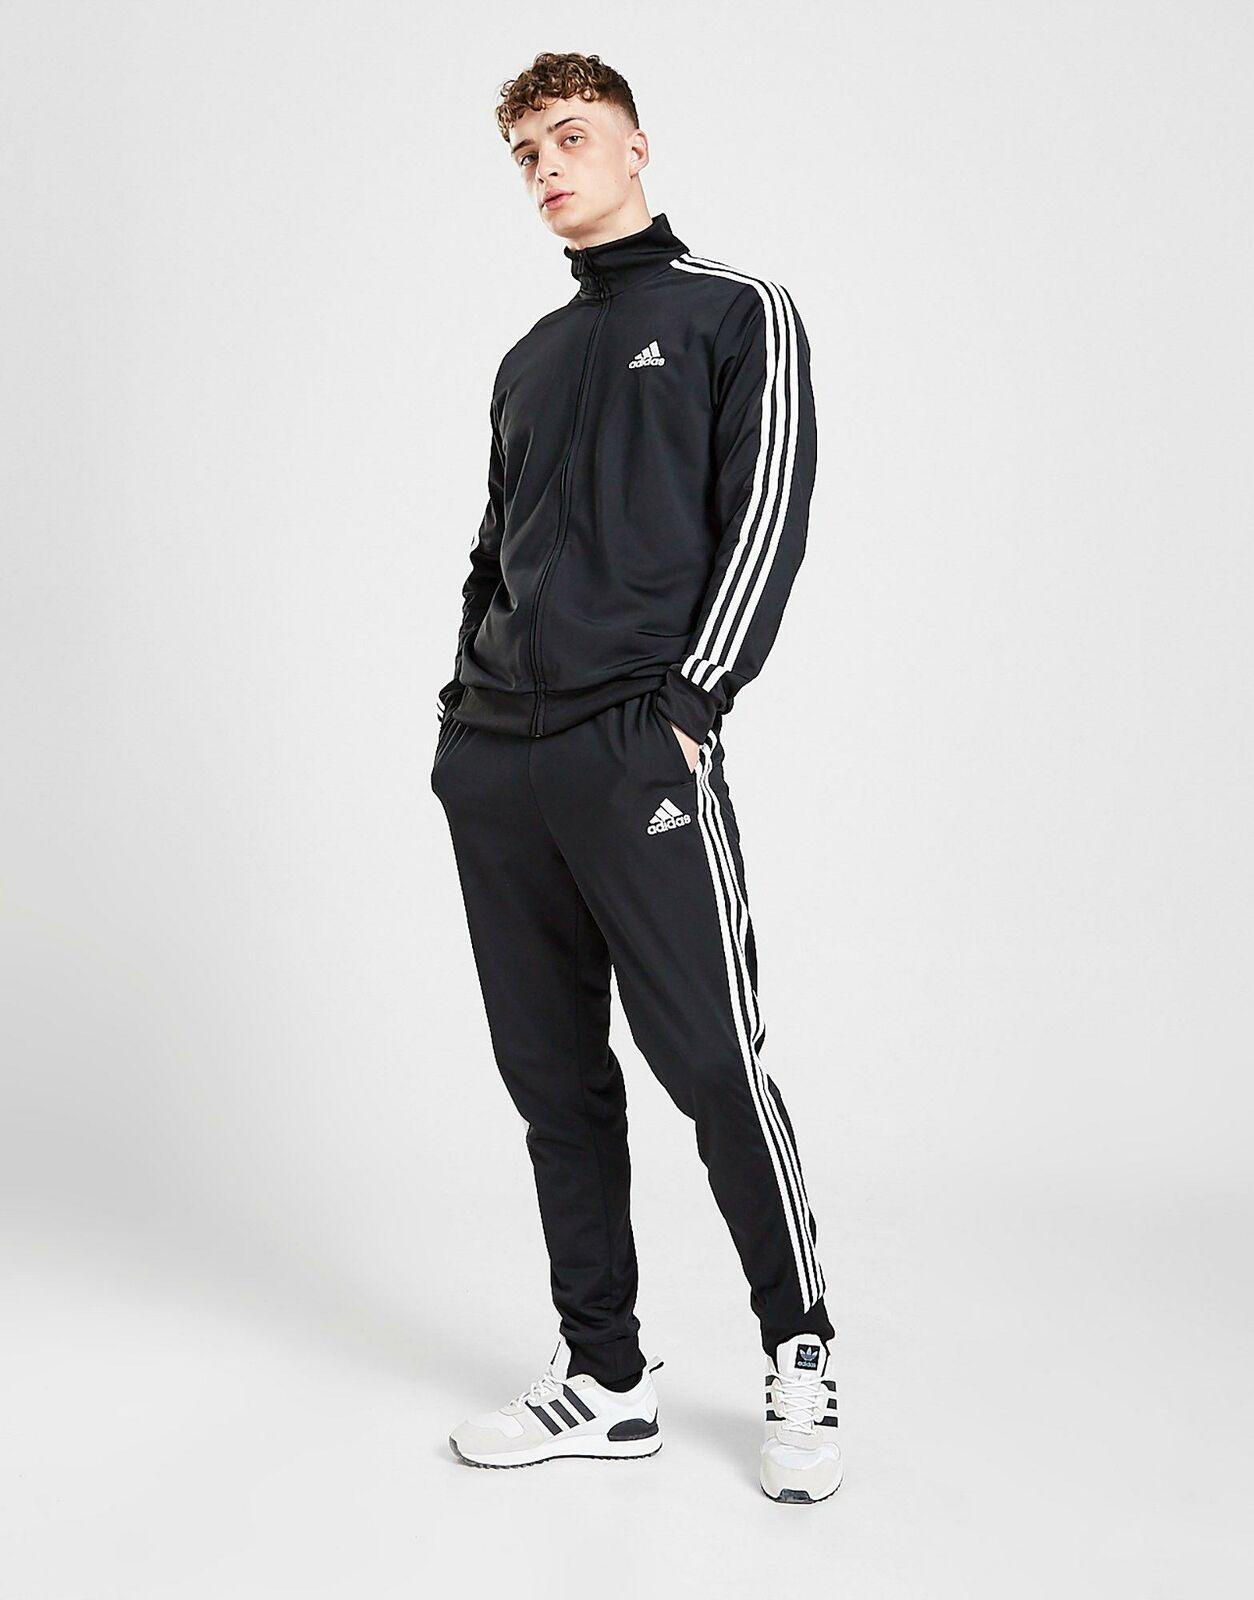 Men's Adidas Tracksuit Set Bottoms Full Zip Jacket Black Trousers Pants M L XL